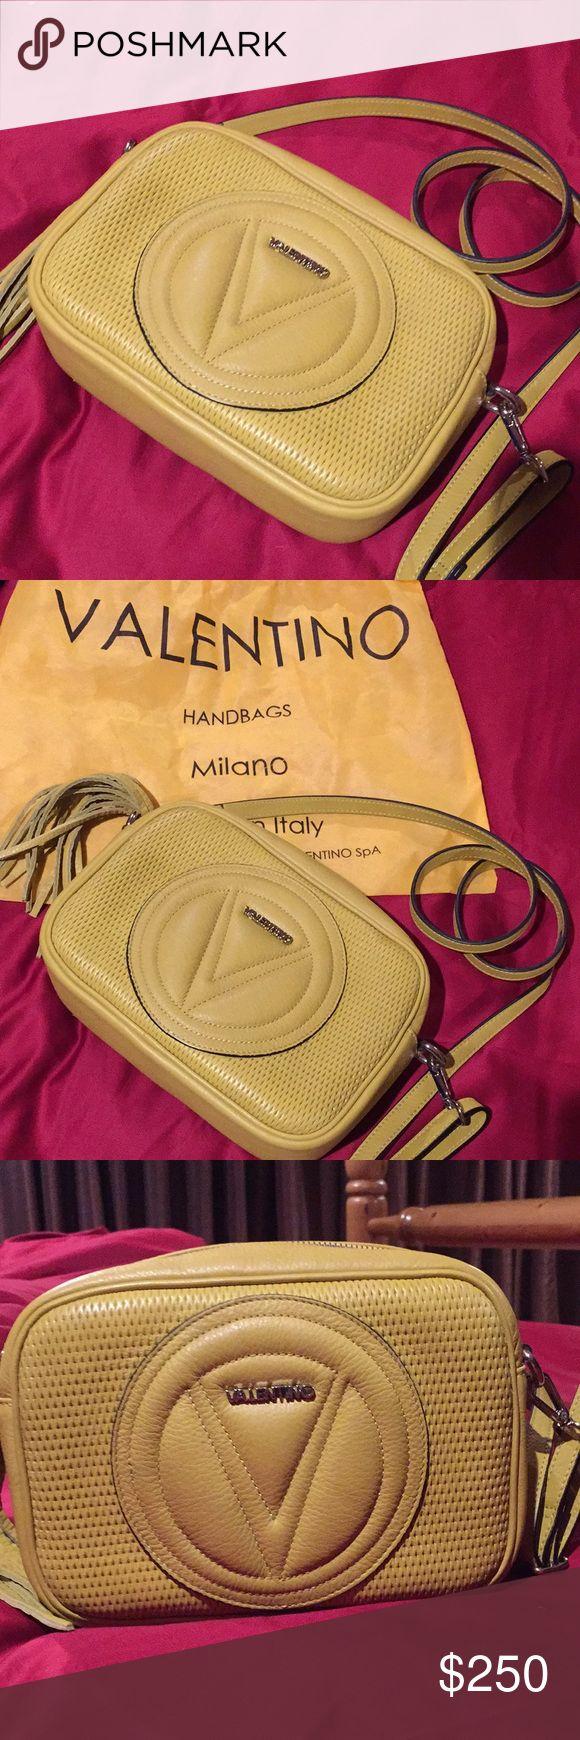 Valentino by Mario Valentino Handbag Valentino by Mario Valentino Crossbody Bag. Only used twice, like new. Great color and a must have style. Perfect for on the go. Mario Valentino Bags Crossbody Bags #valentinohandbag